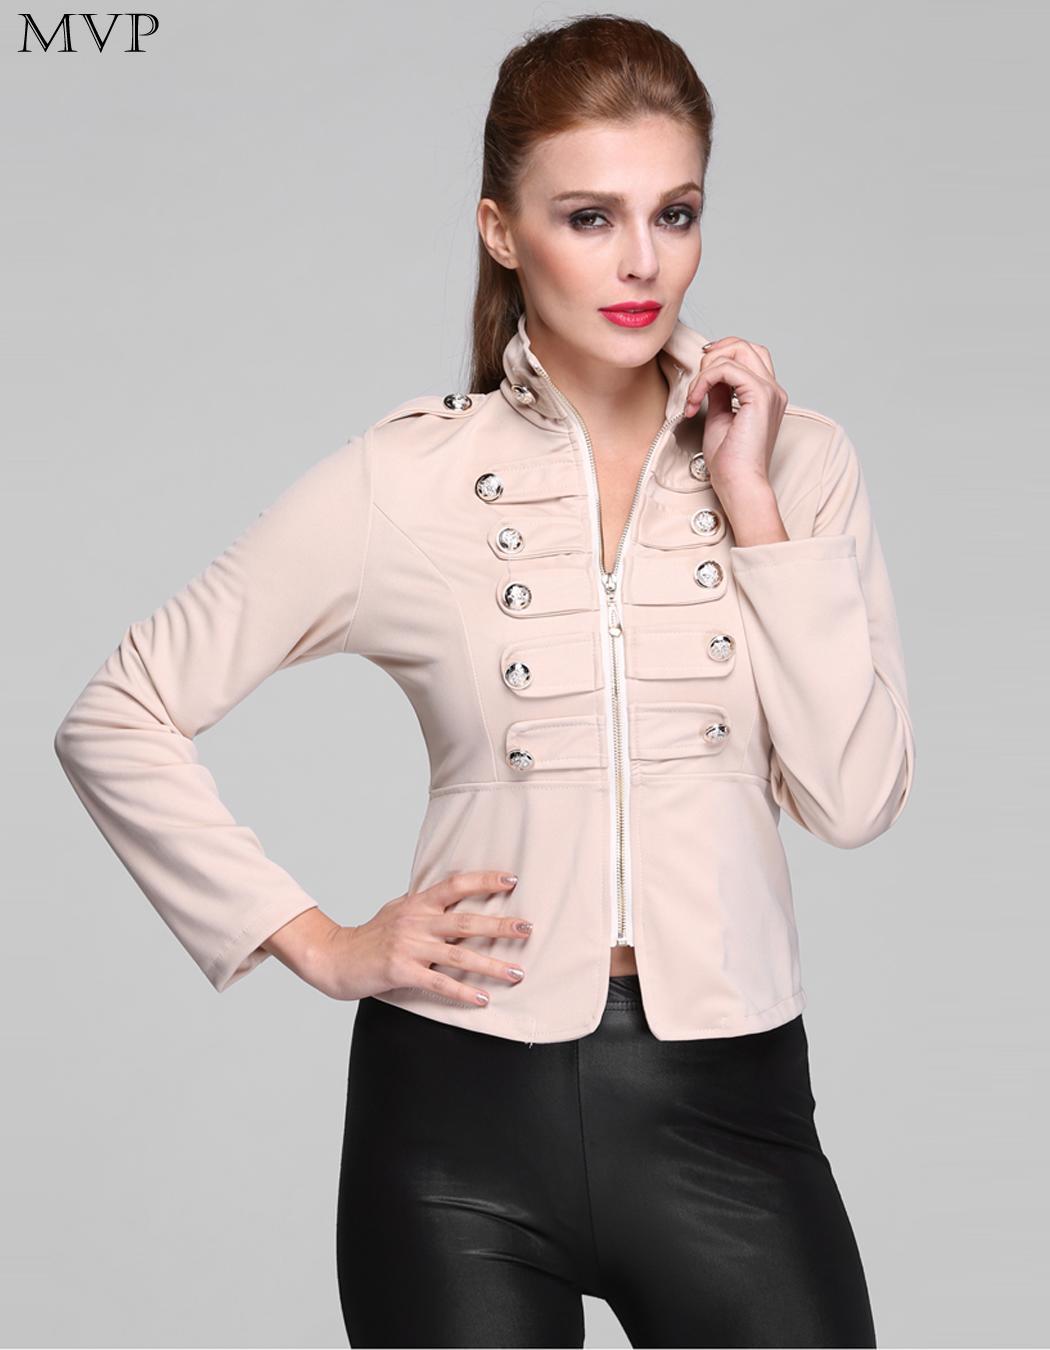 Spring Autumn Jacket Women Coat 2018 Fashion Women Coats Long Sleeve New Women Coat Jackets Zipper Outwear